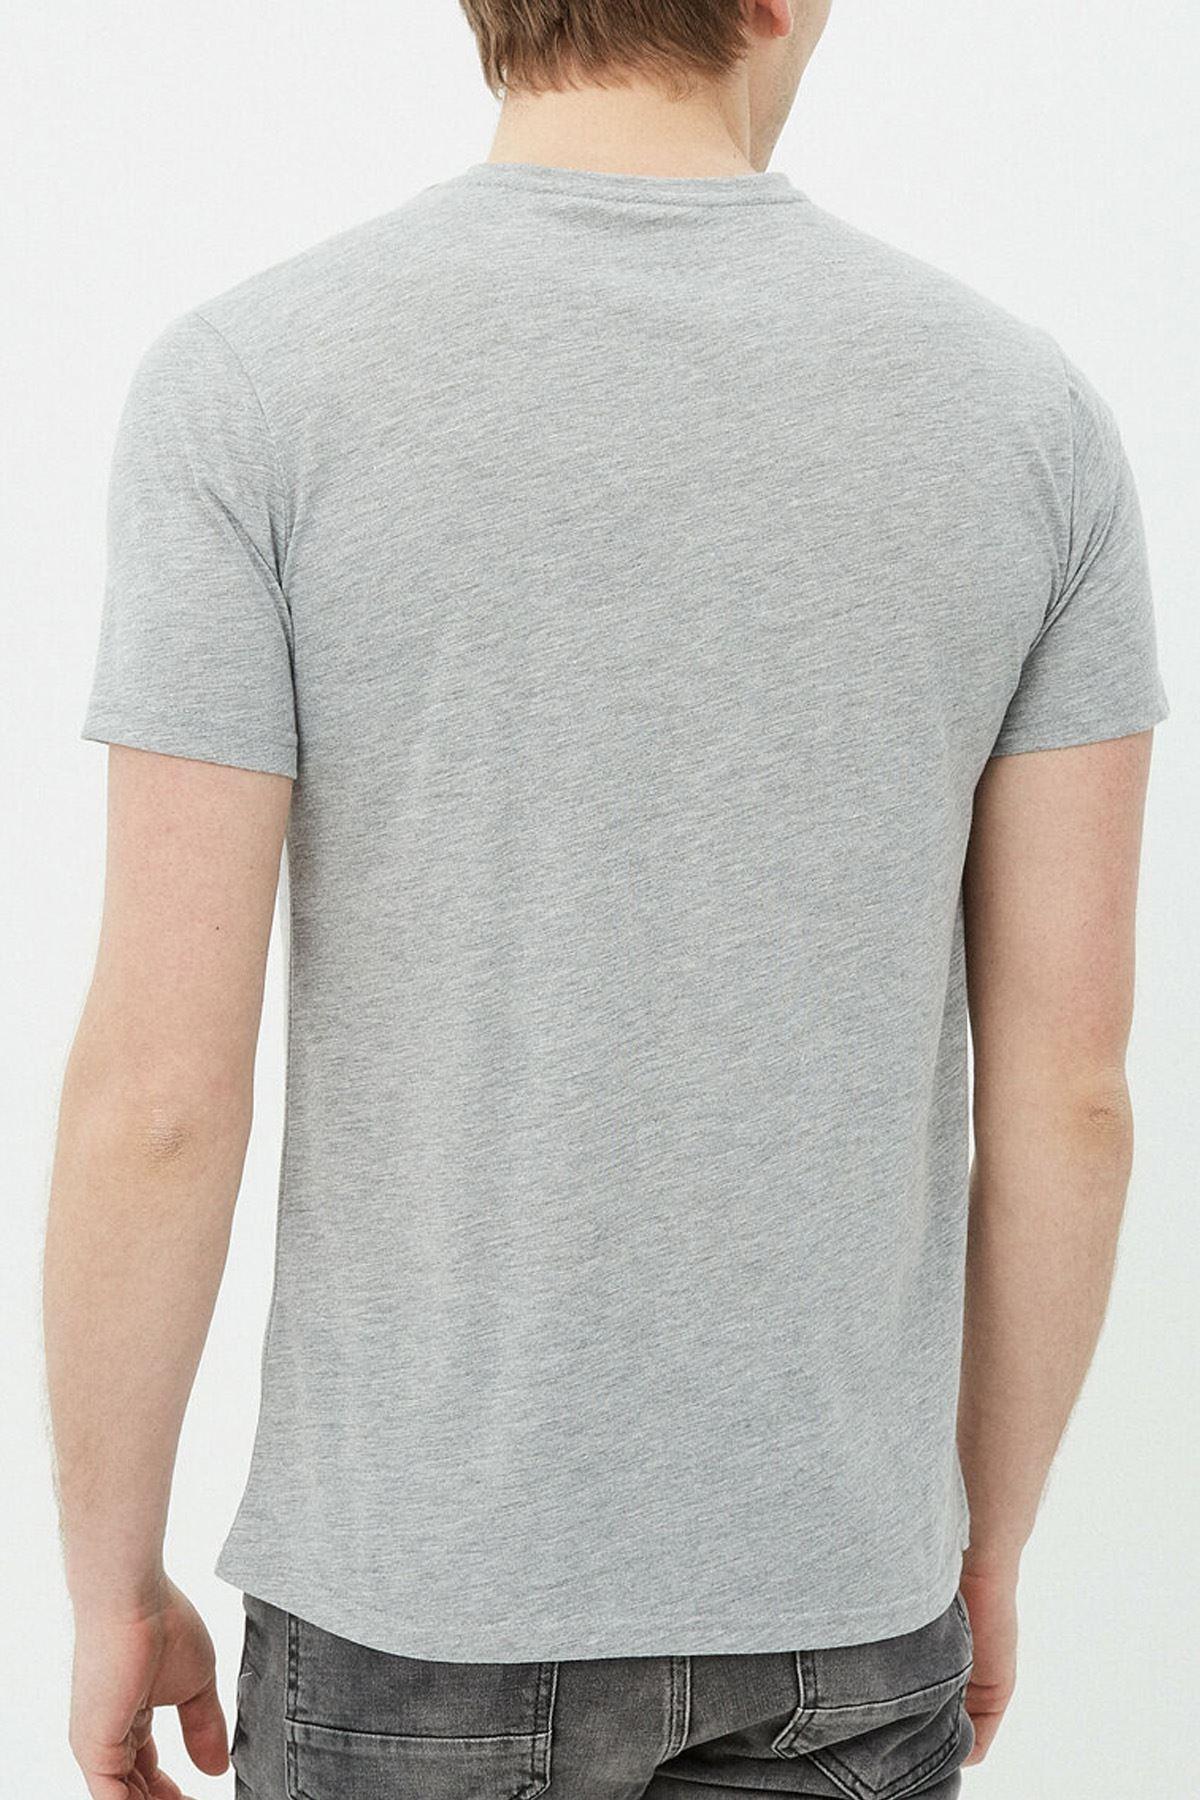 Anime Ryukkira 02 Gri Erkek Tshirt - Tişört